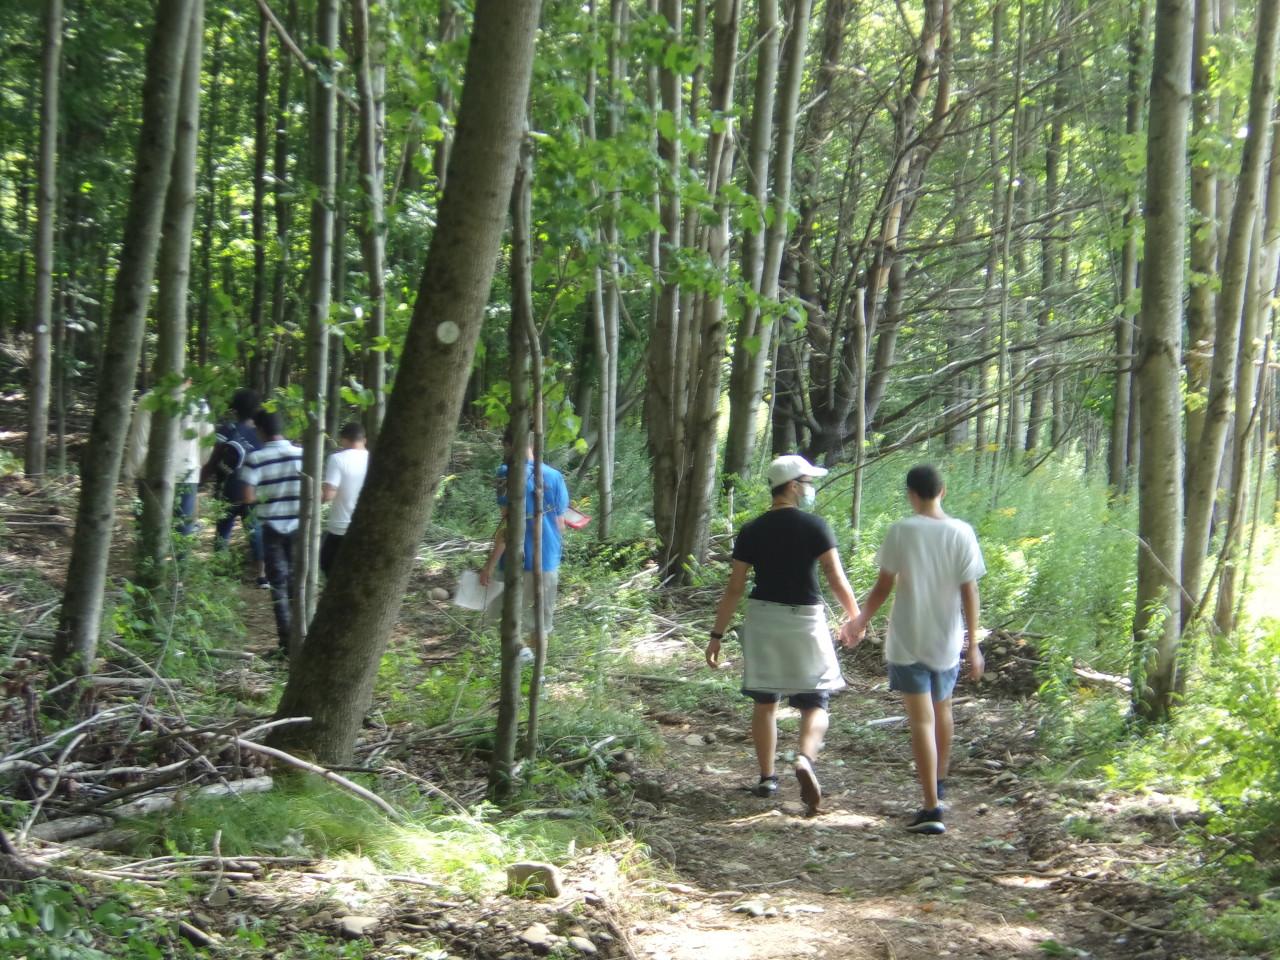 MainCampusTrail5 - Hitting the Trail - Take a Look Tuesday